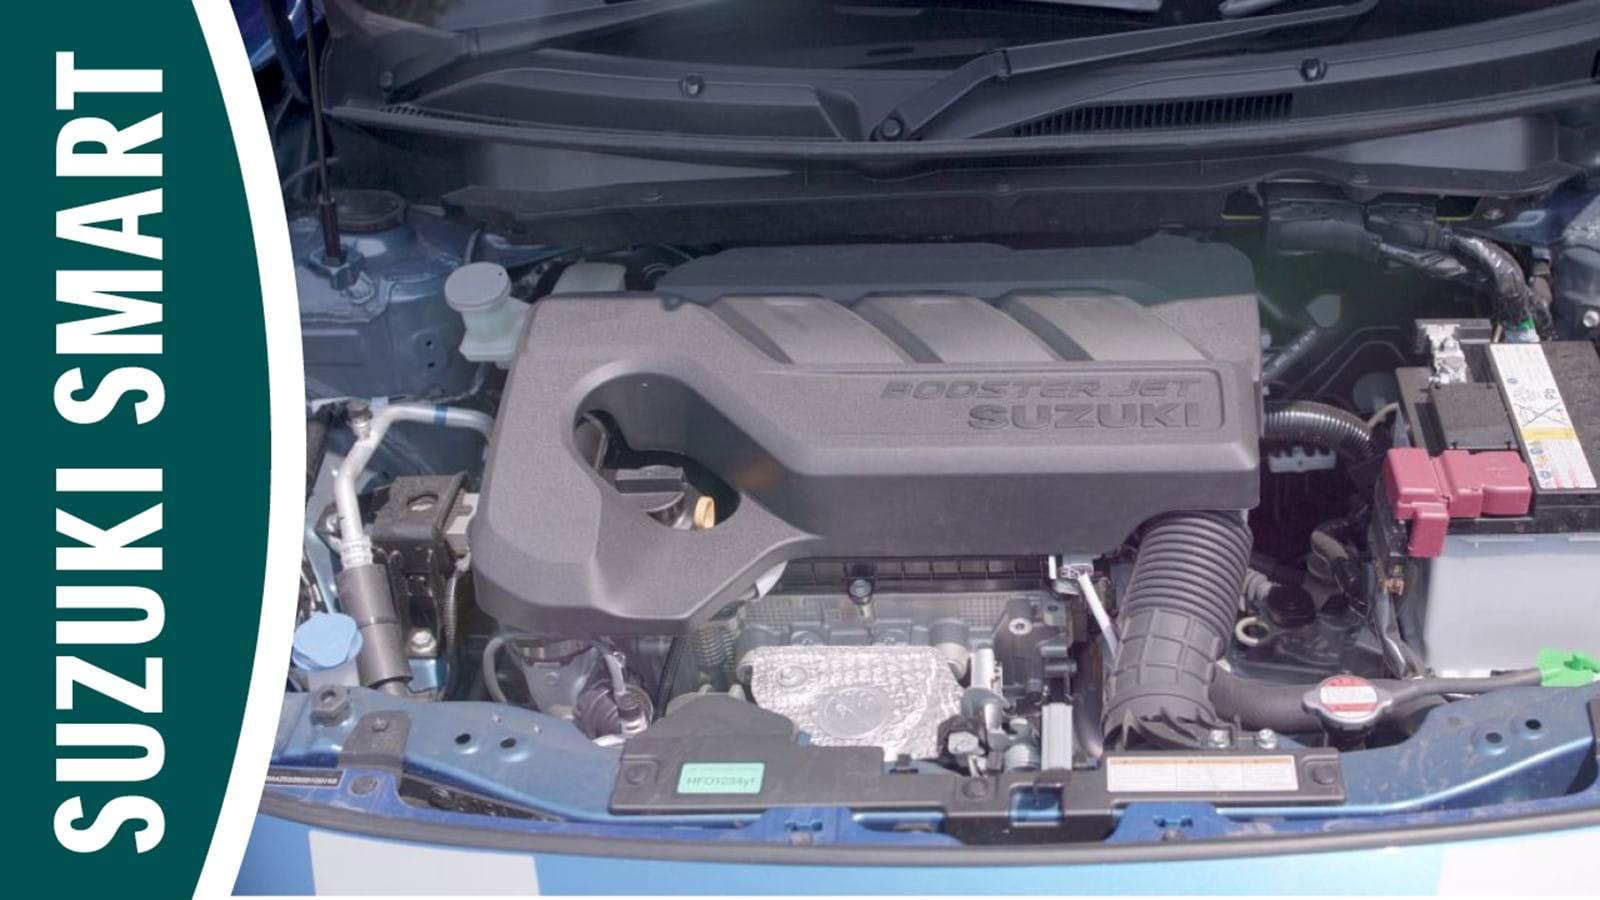 Suzuki service promise find out more today suzuki cars uk play video solutioingenieria Gallery